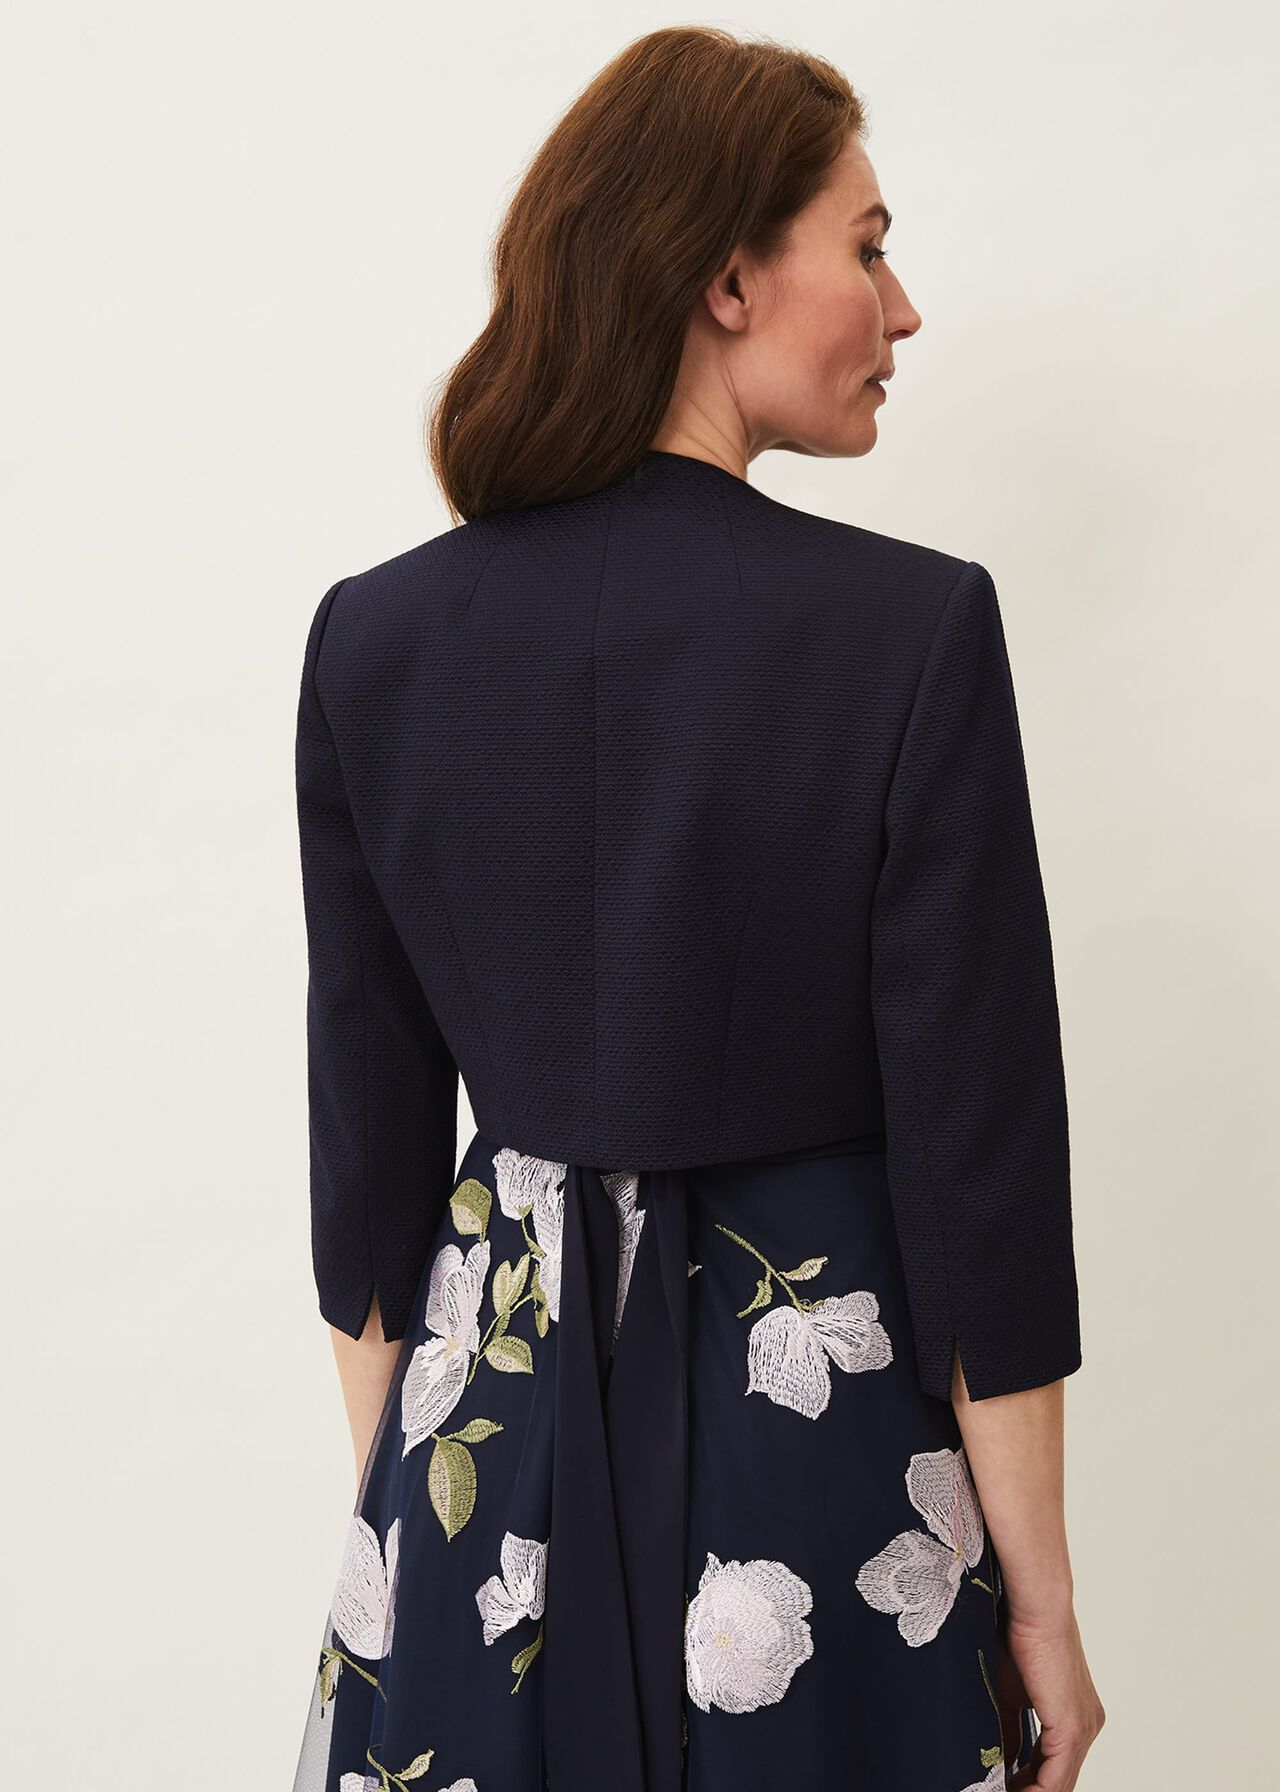 Karlee Textured Occasion Jacket